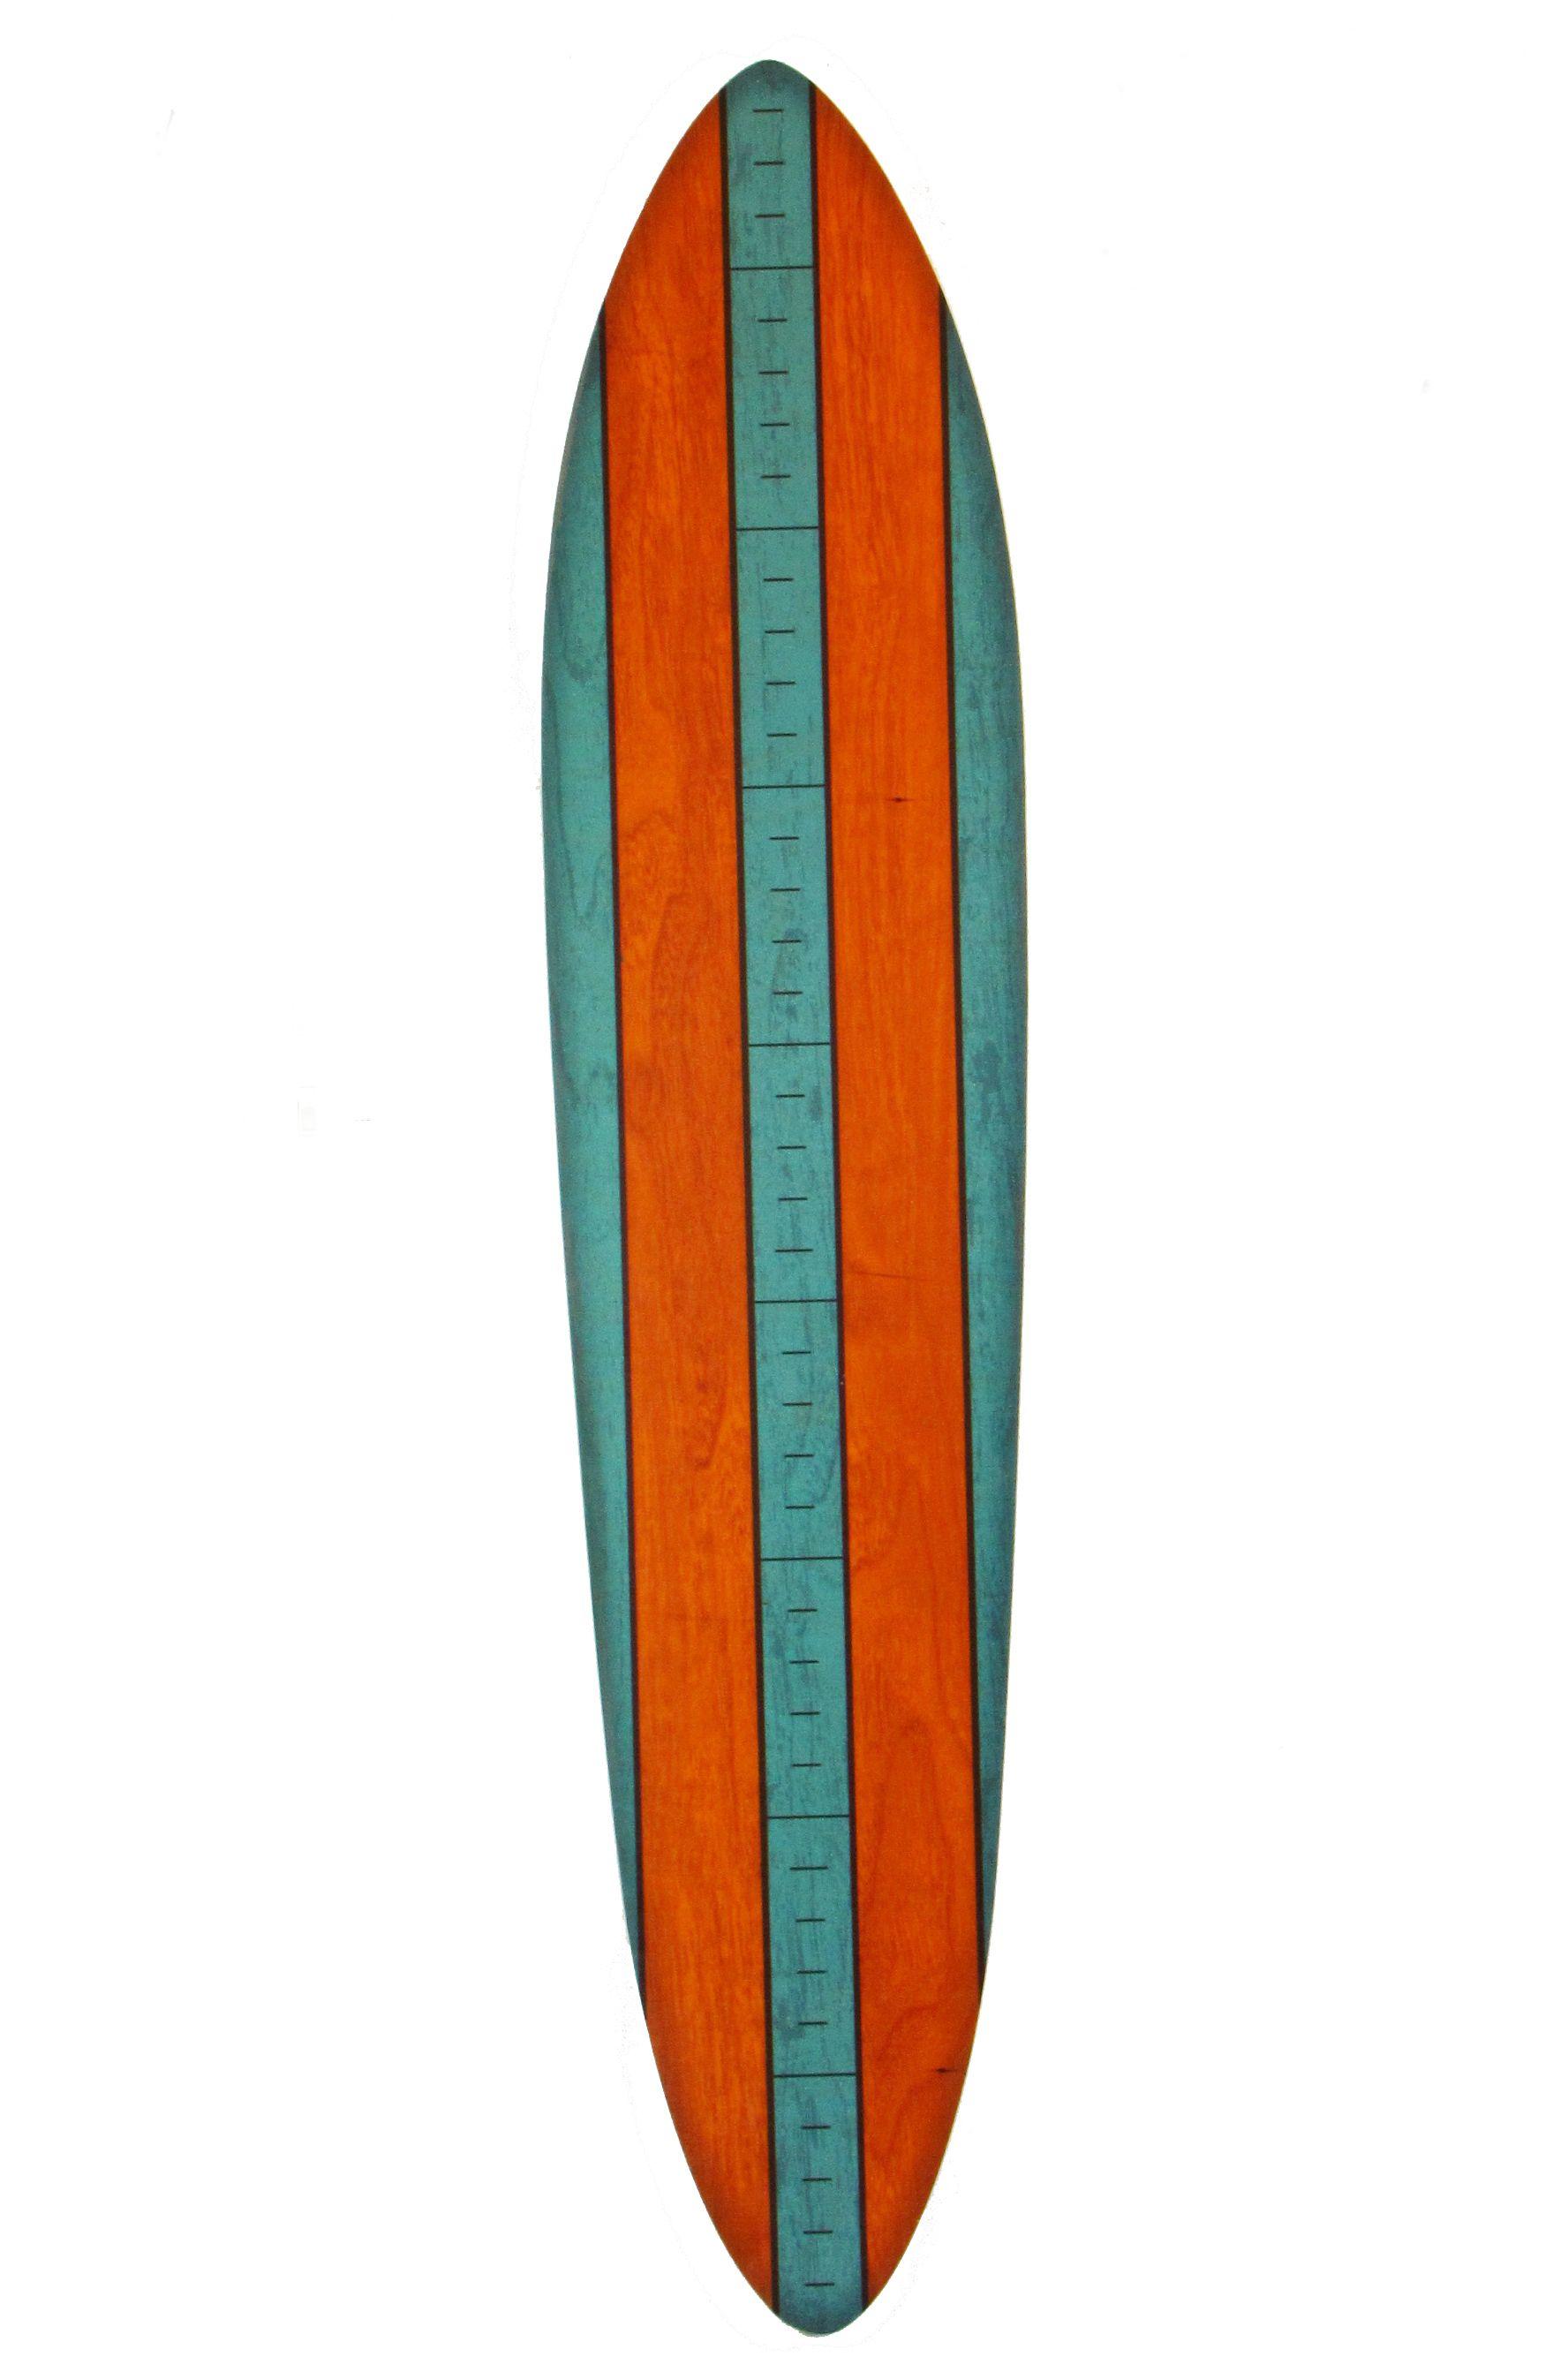 surfboard13jpg 17762152686 surfs up pinterest